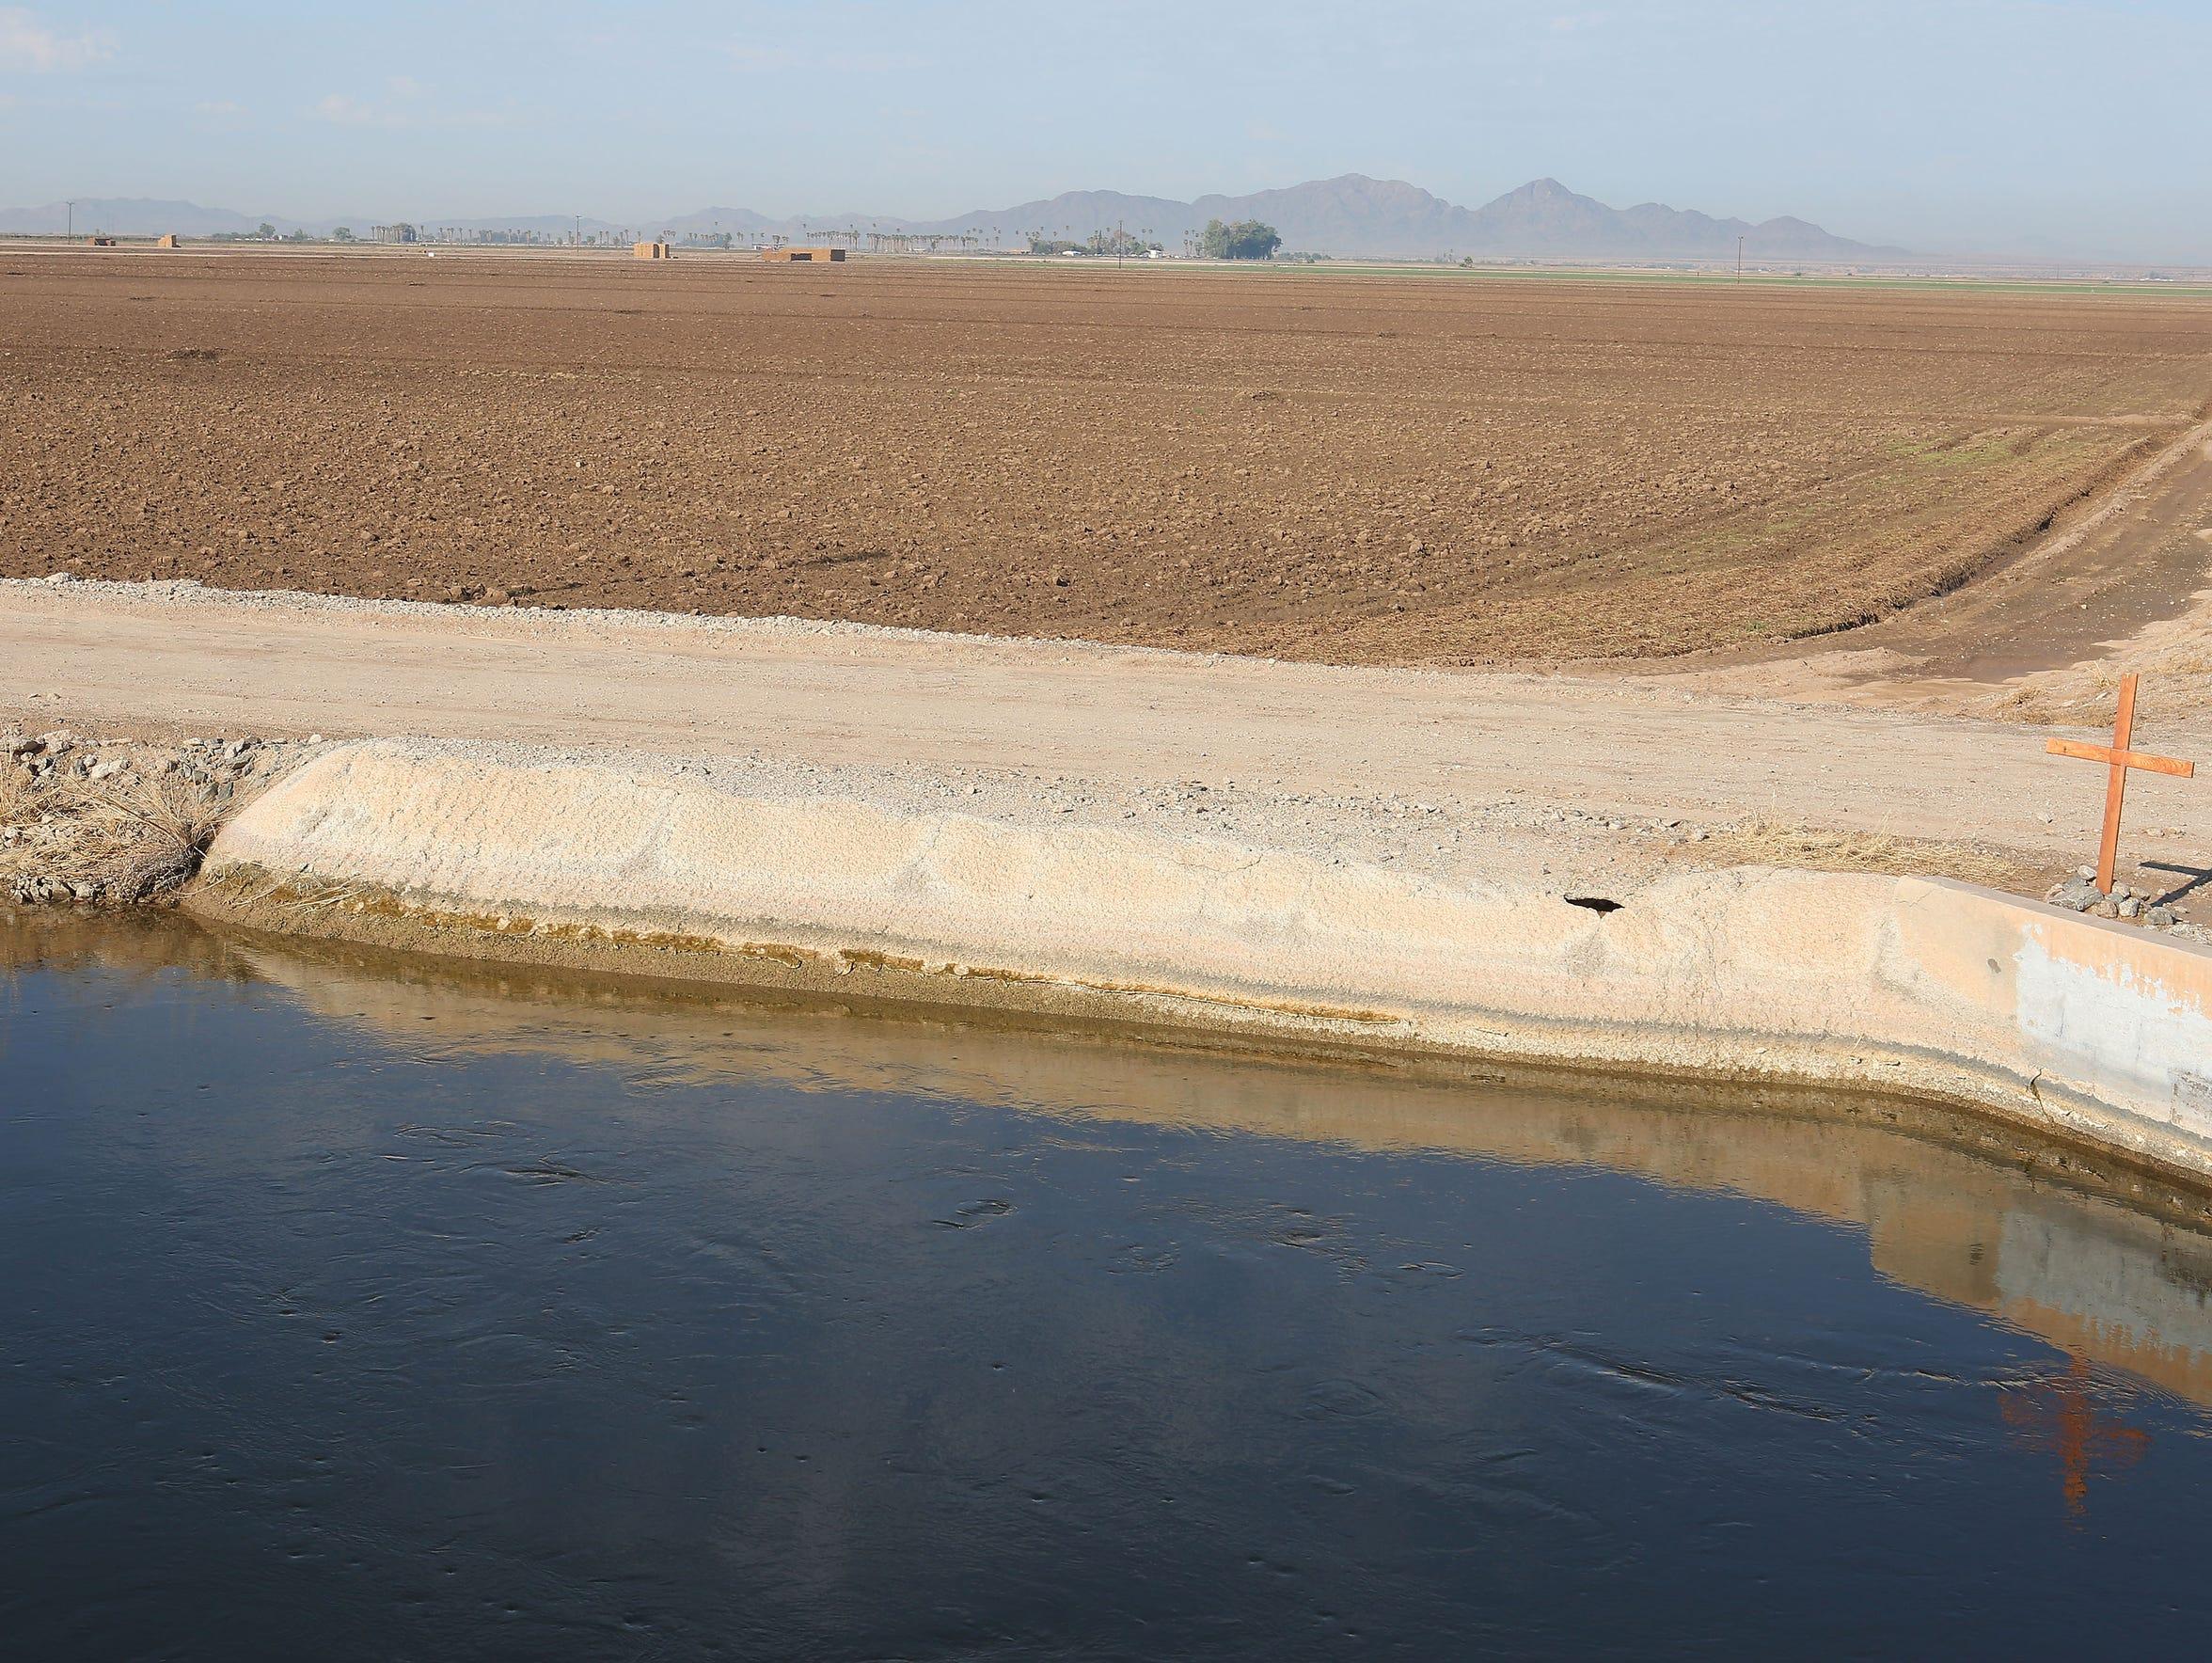 A dry field runs alongside an irrigation canal near